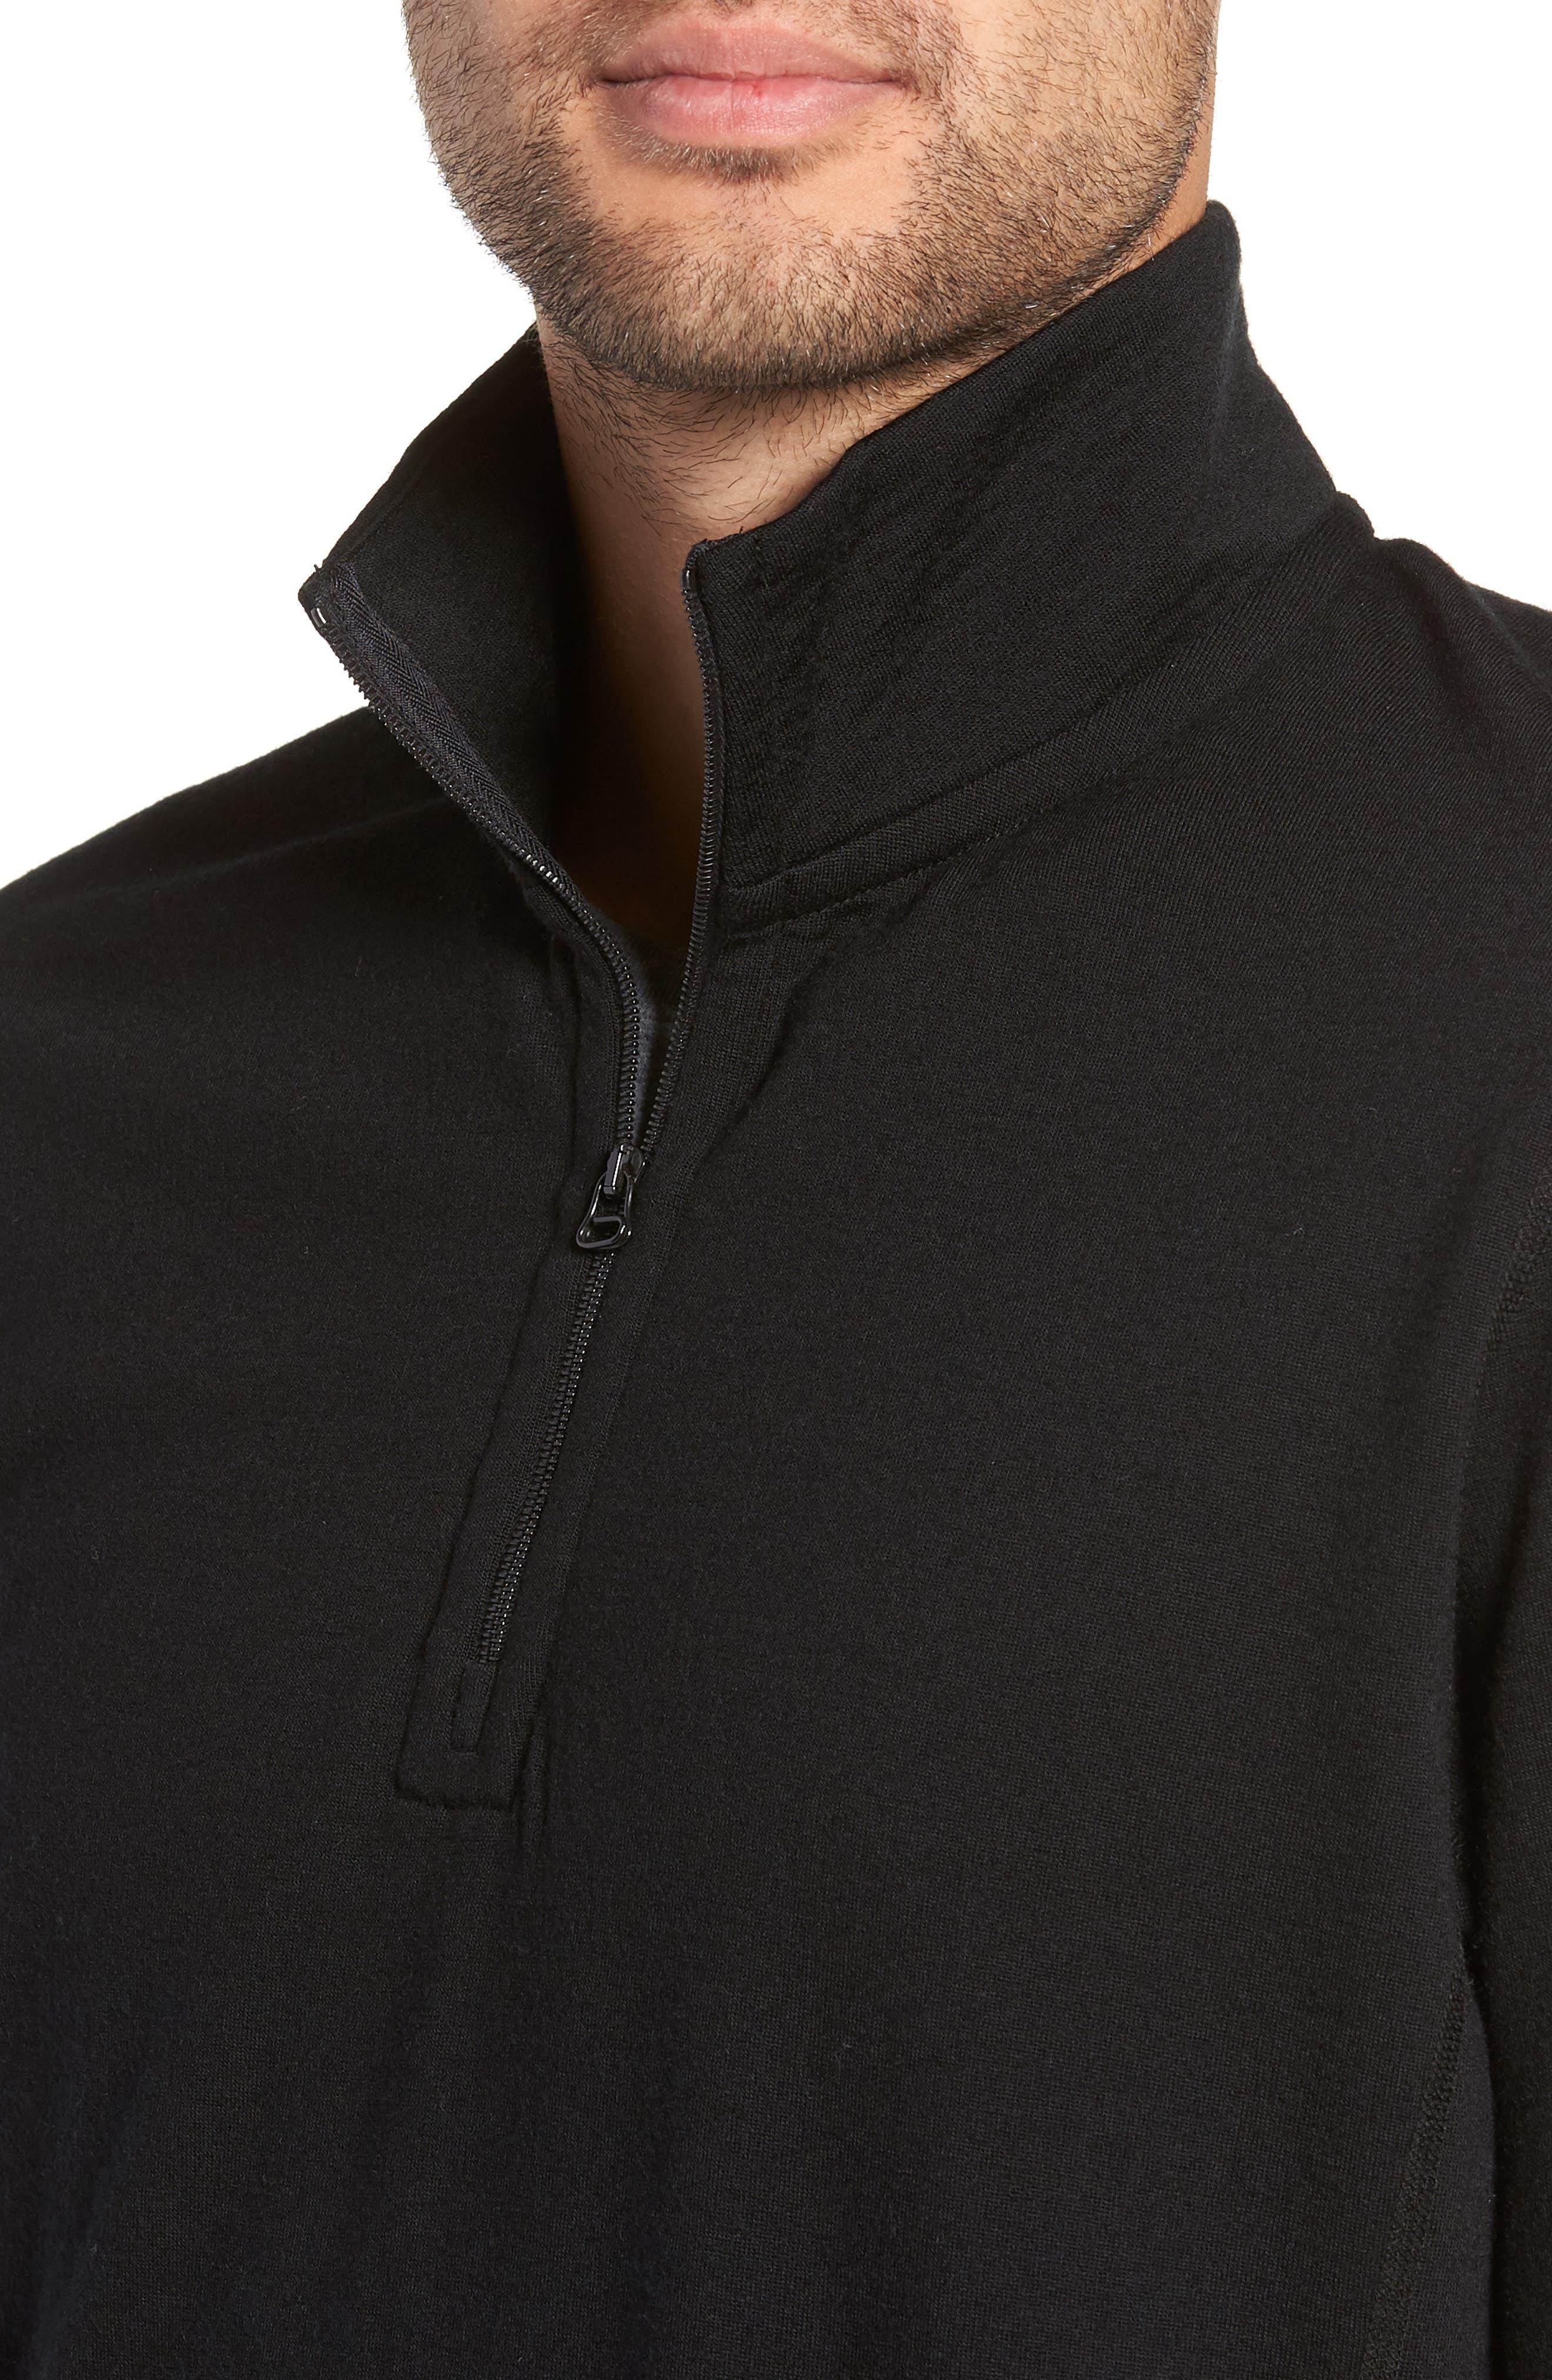 Swedish Merino Wool Trail Shirt,                             Alternate thumbnail 4, color,                             BLACK